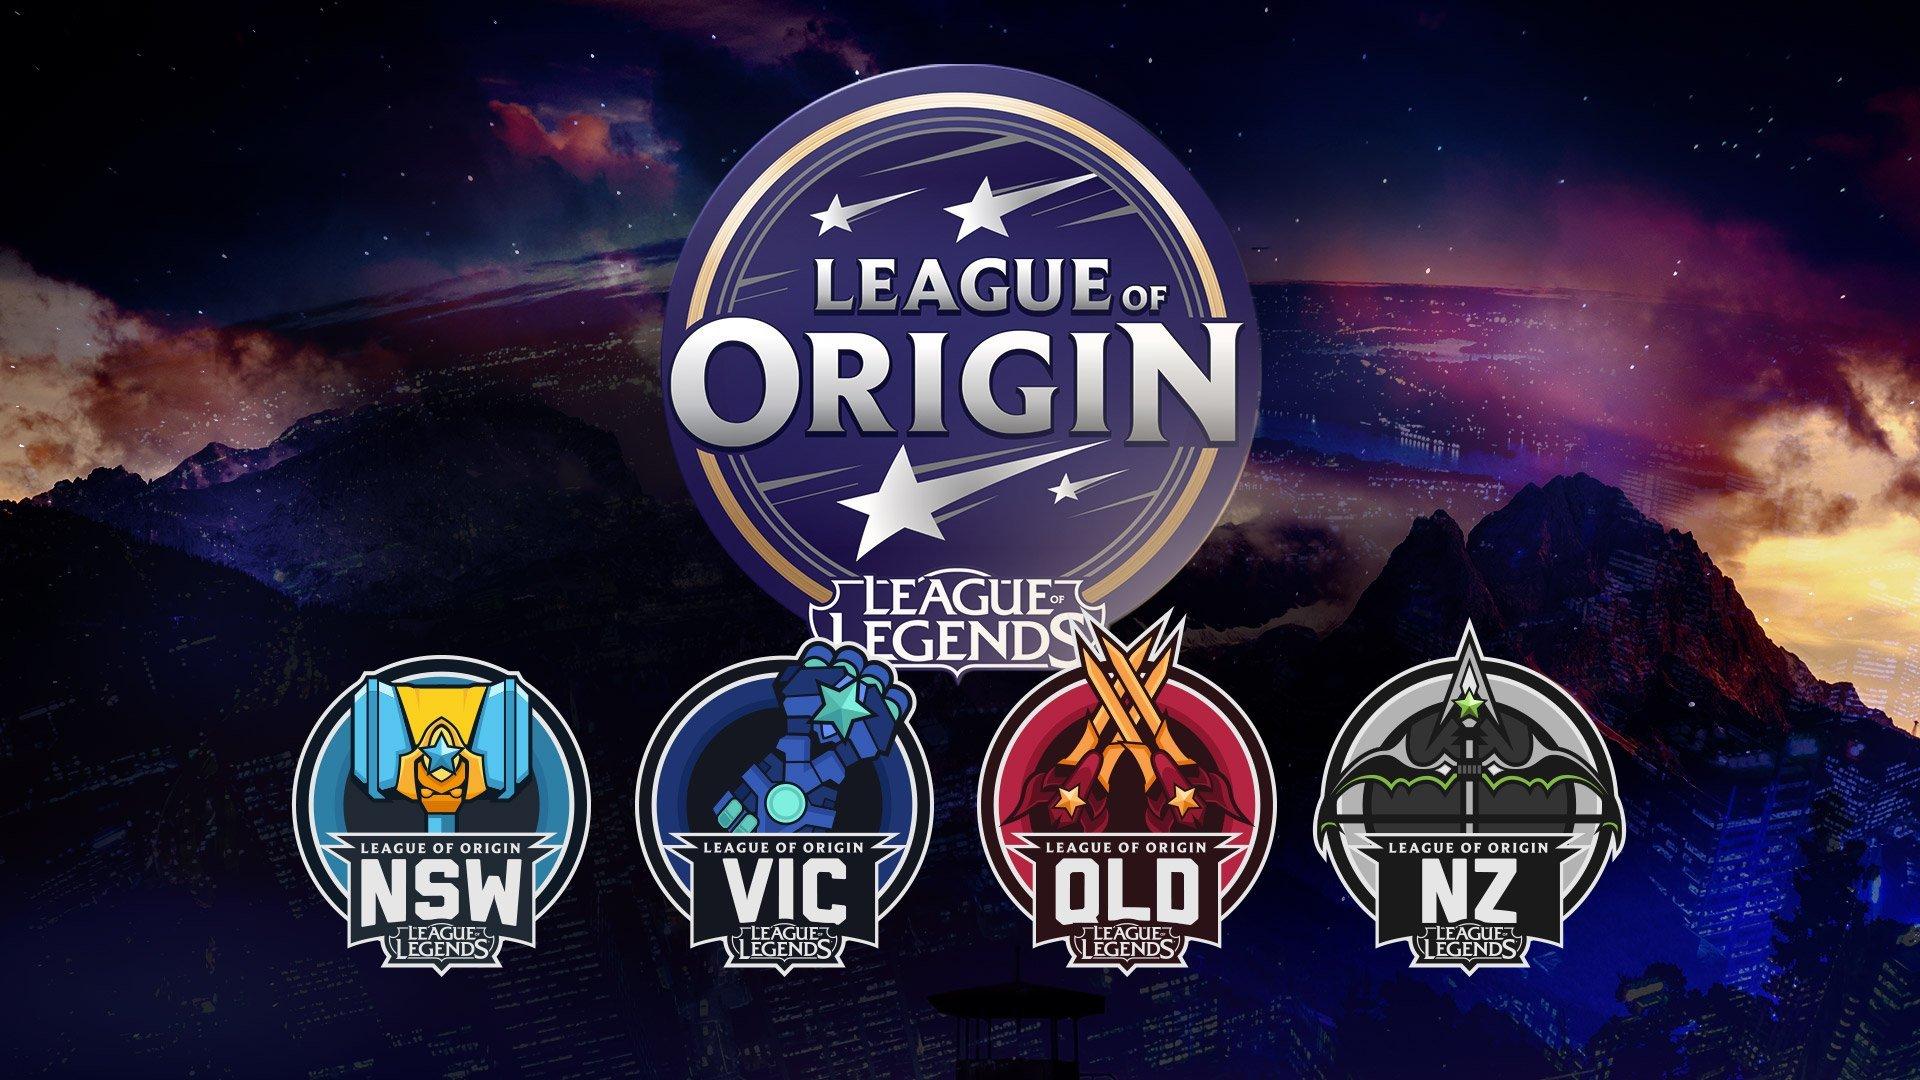 League-of-Origin-Captains-Announced.jpg